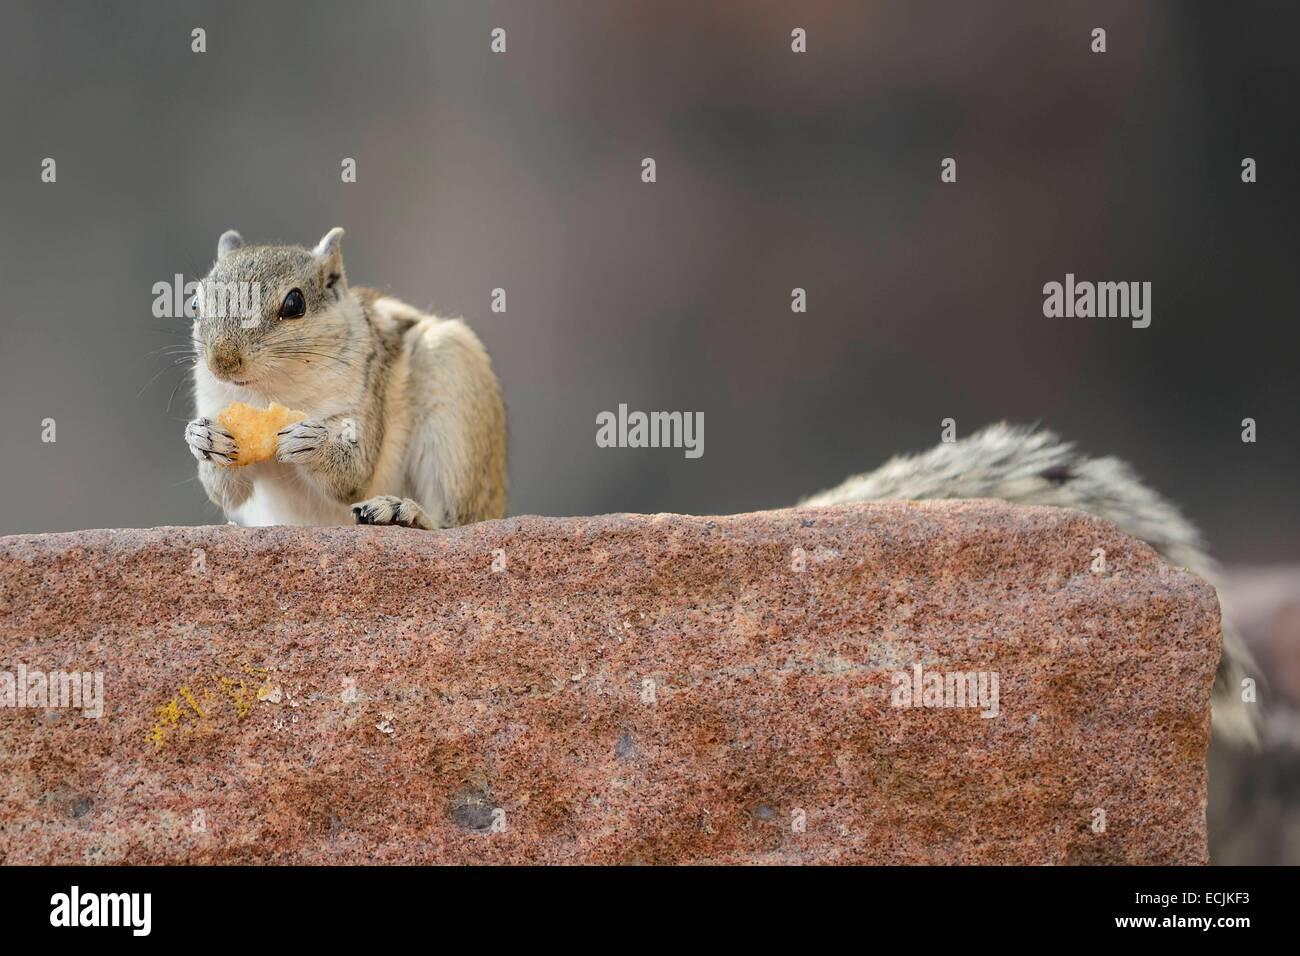 India, Rajasthan, Jodhpur region, Squirrel - Stock Image